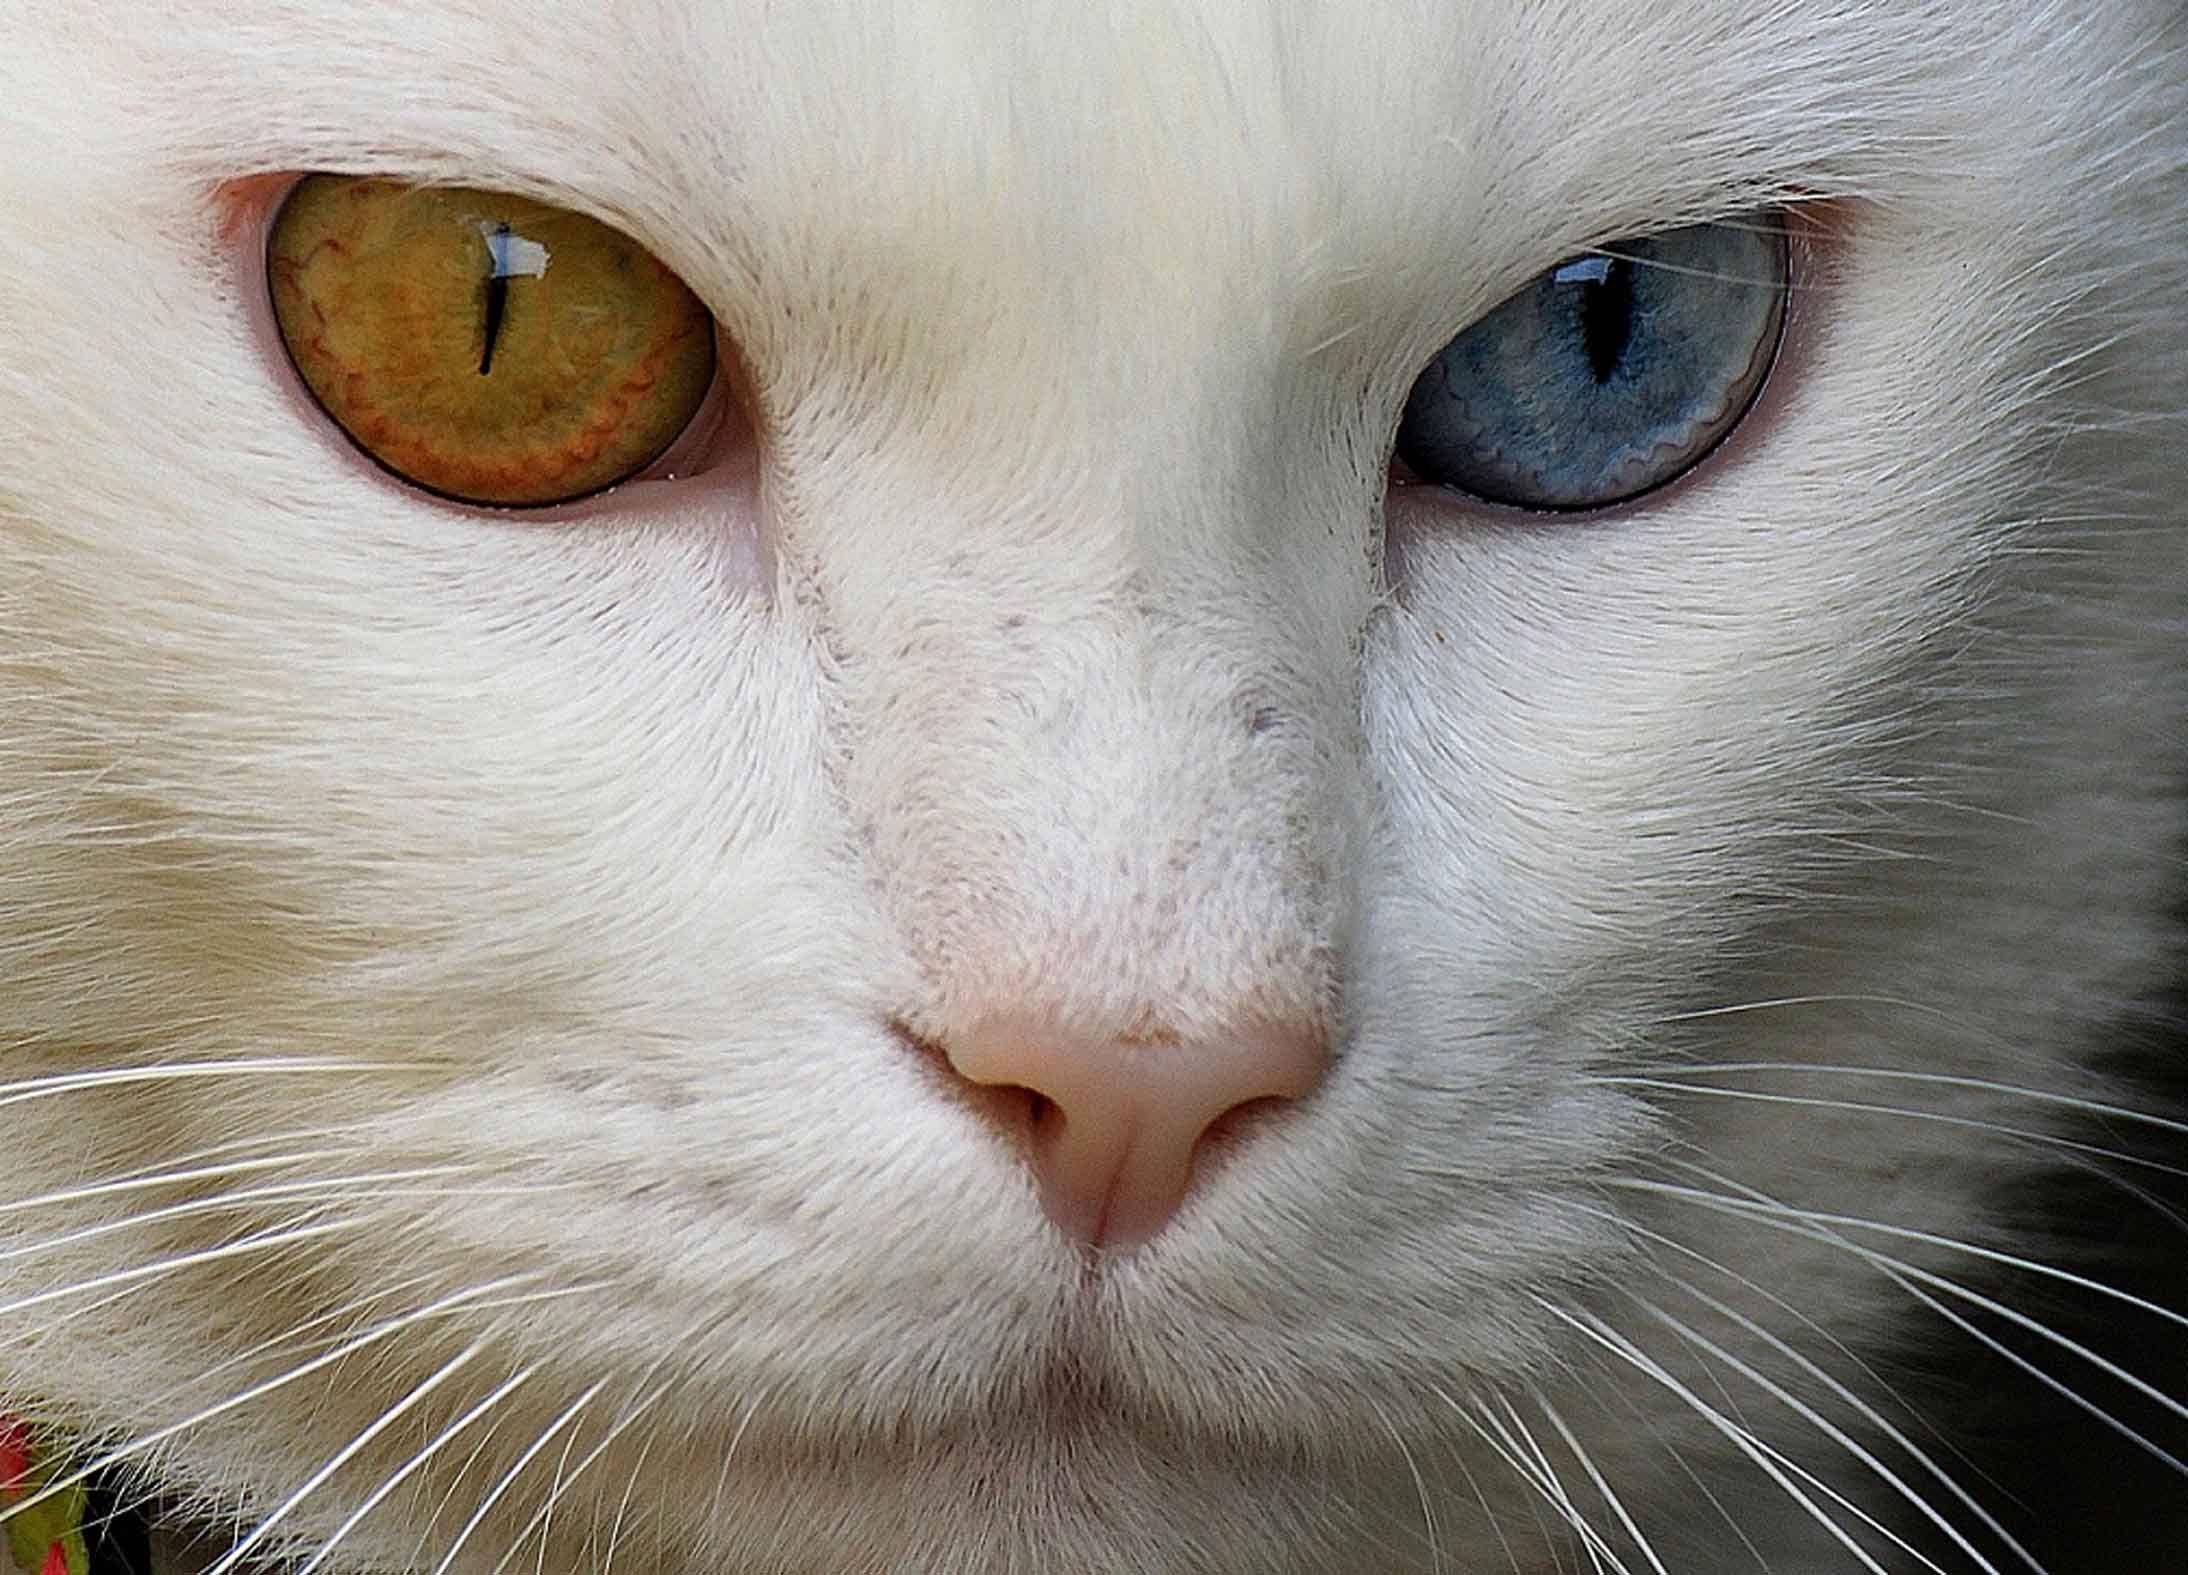 looks just like BEGE (blue eye, green eye) my cat from my